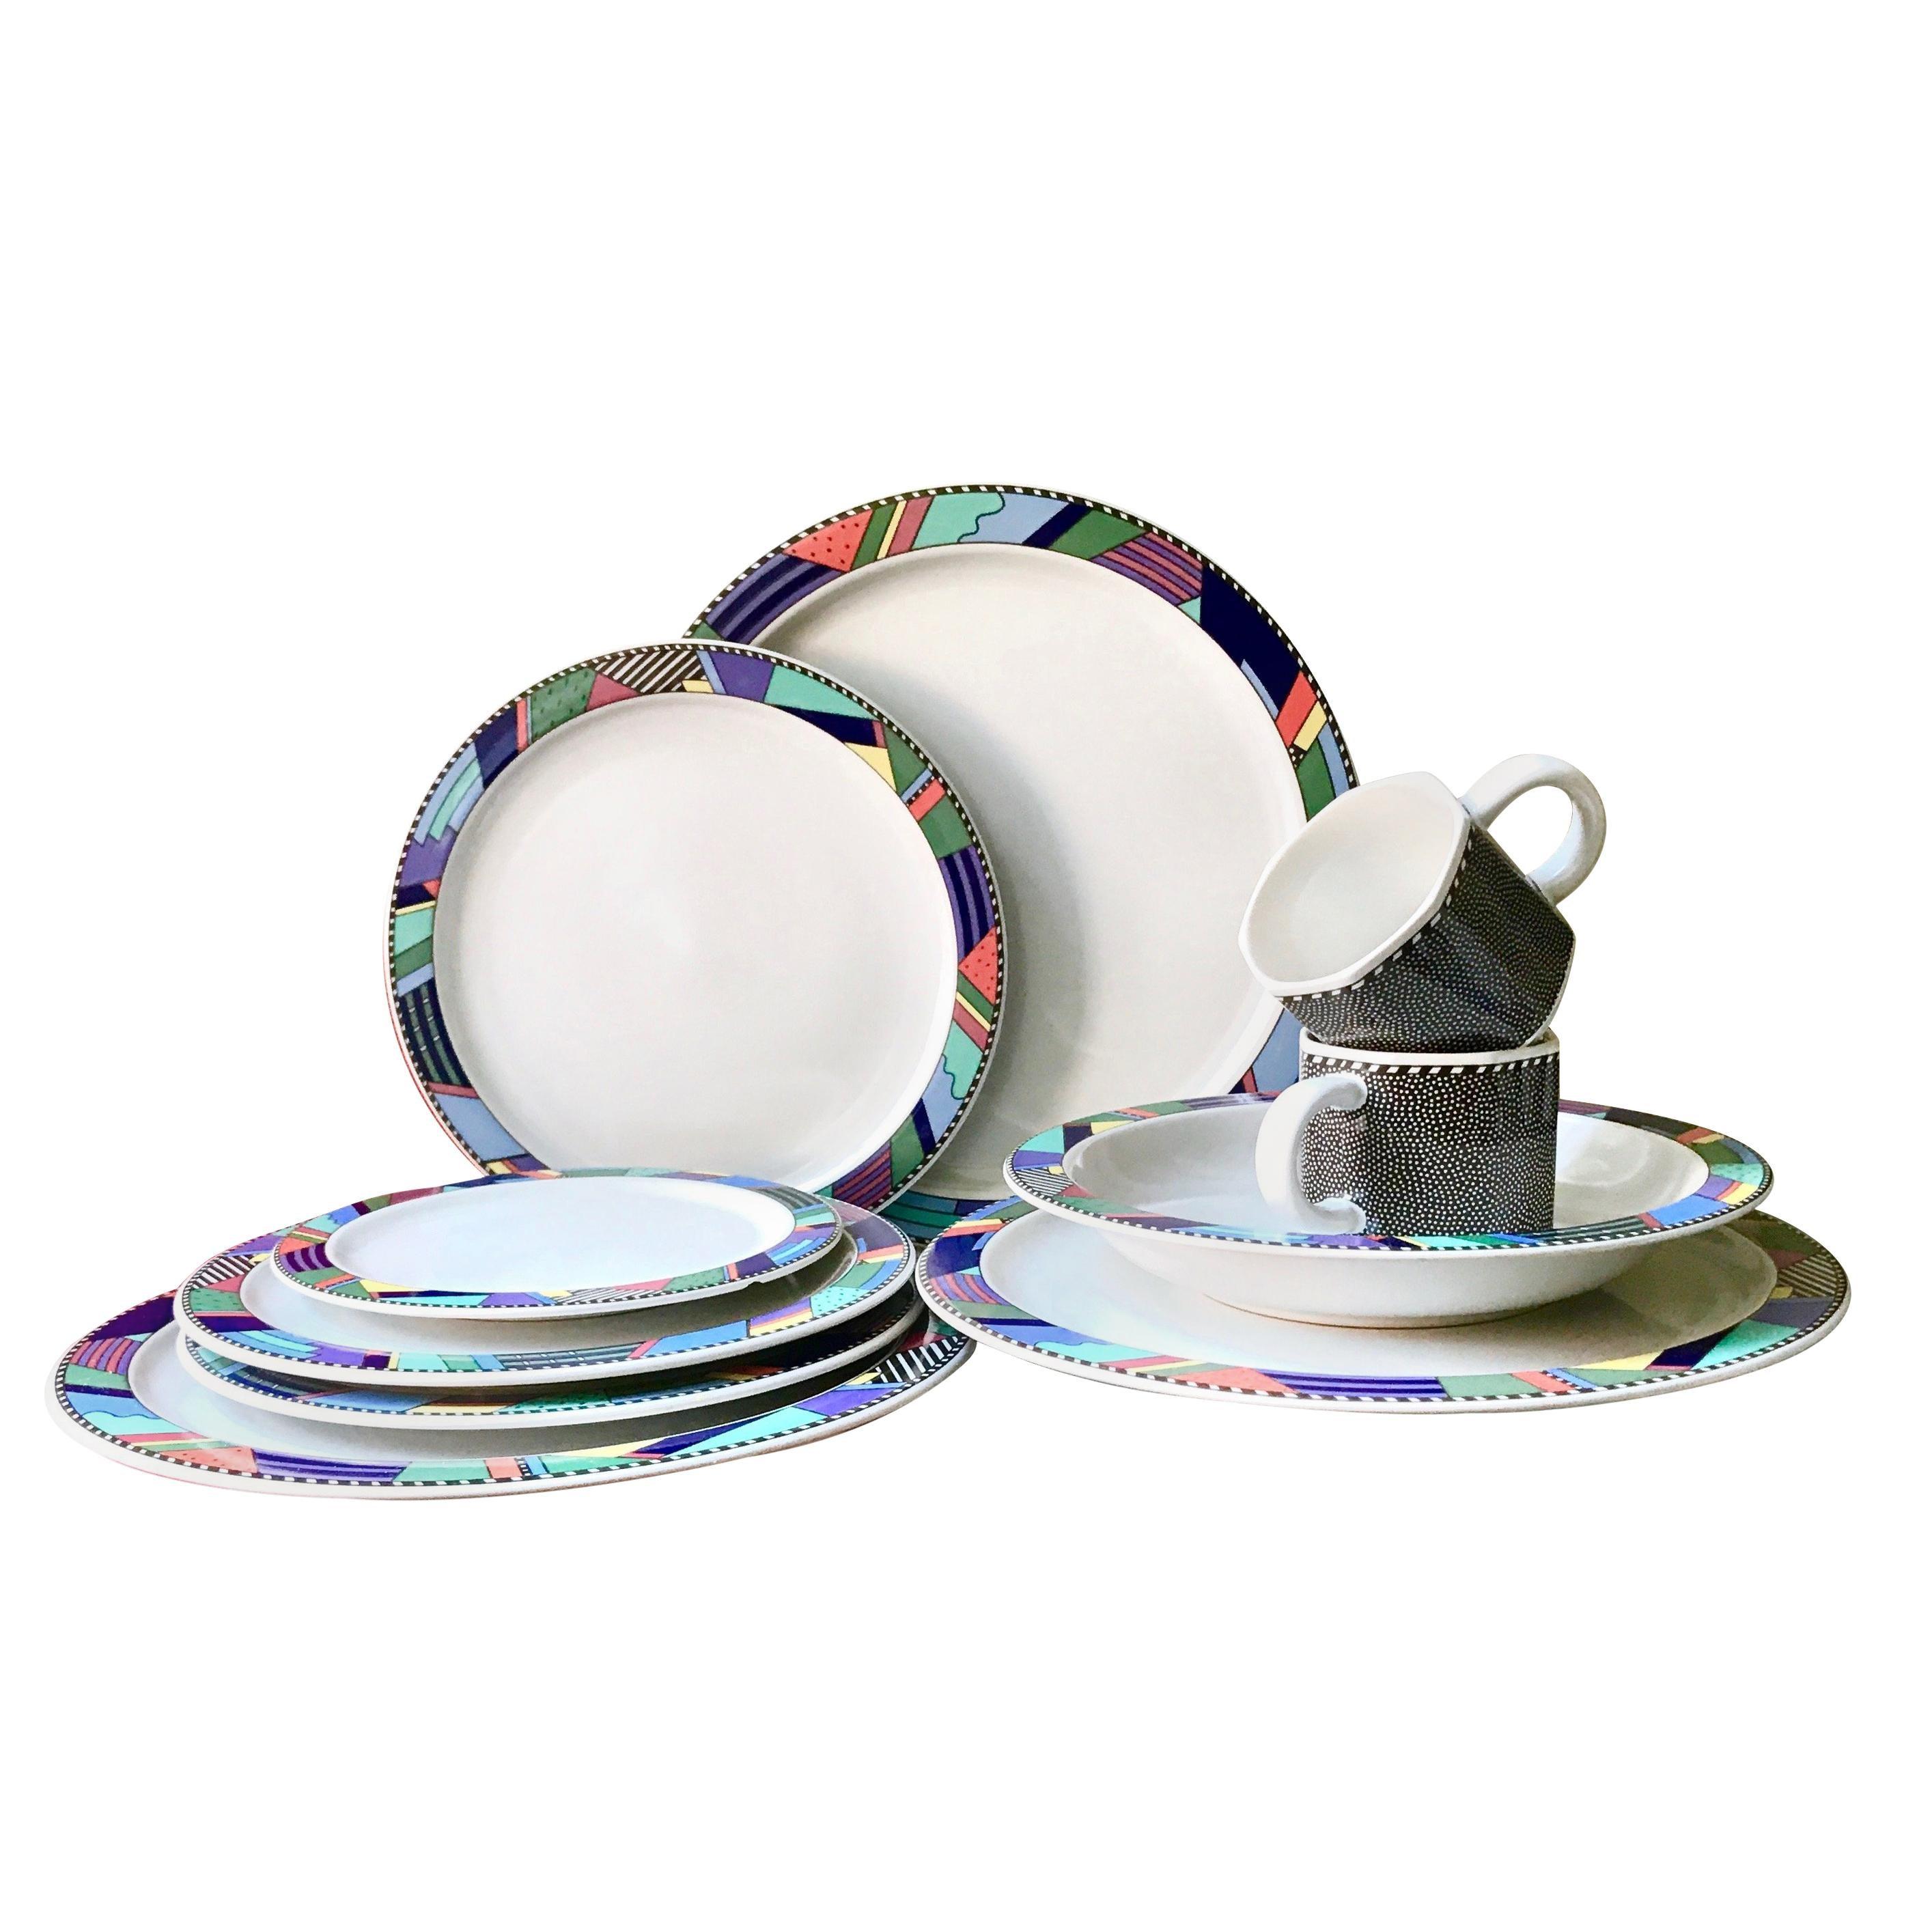 Rosenthal Studio Line Scenario Barbara Brenner Dinnerware Porcelain Memphis Era